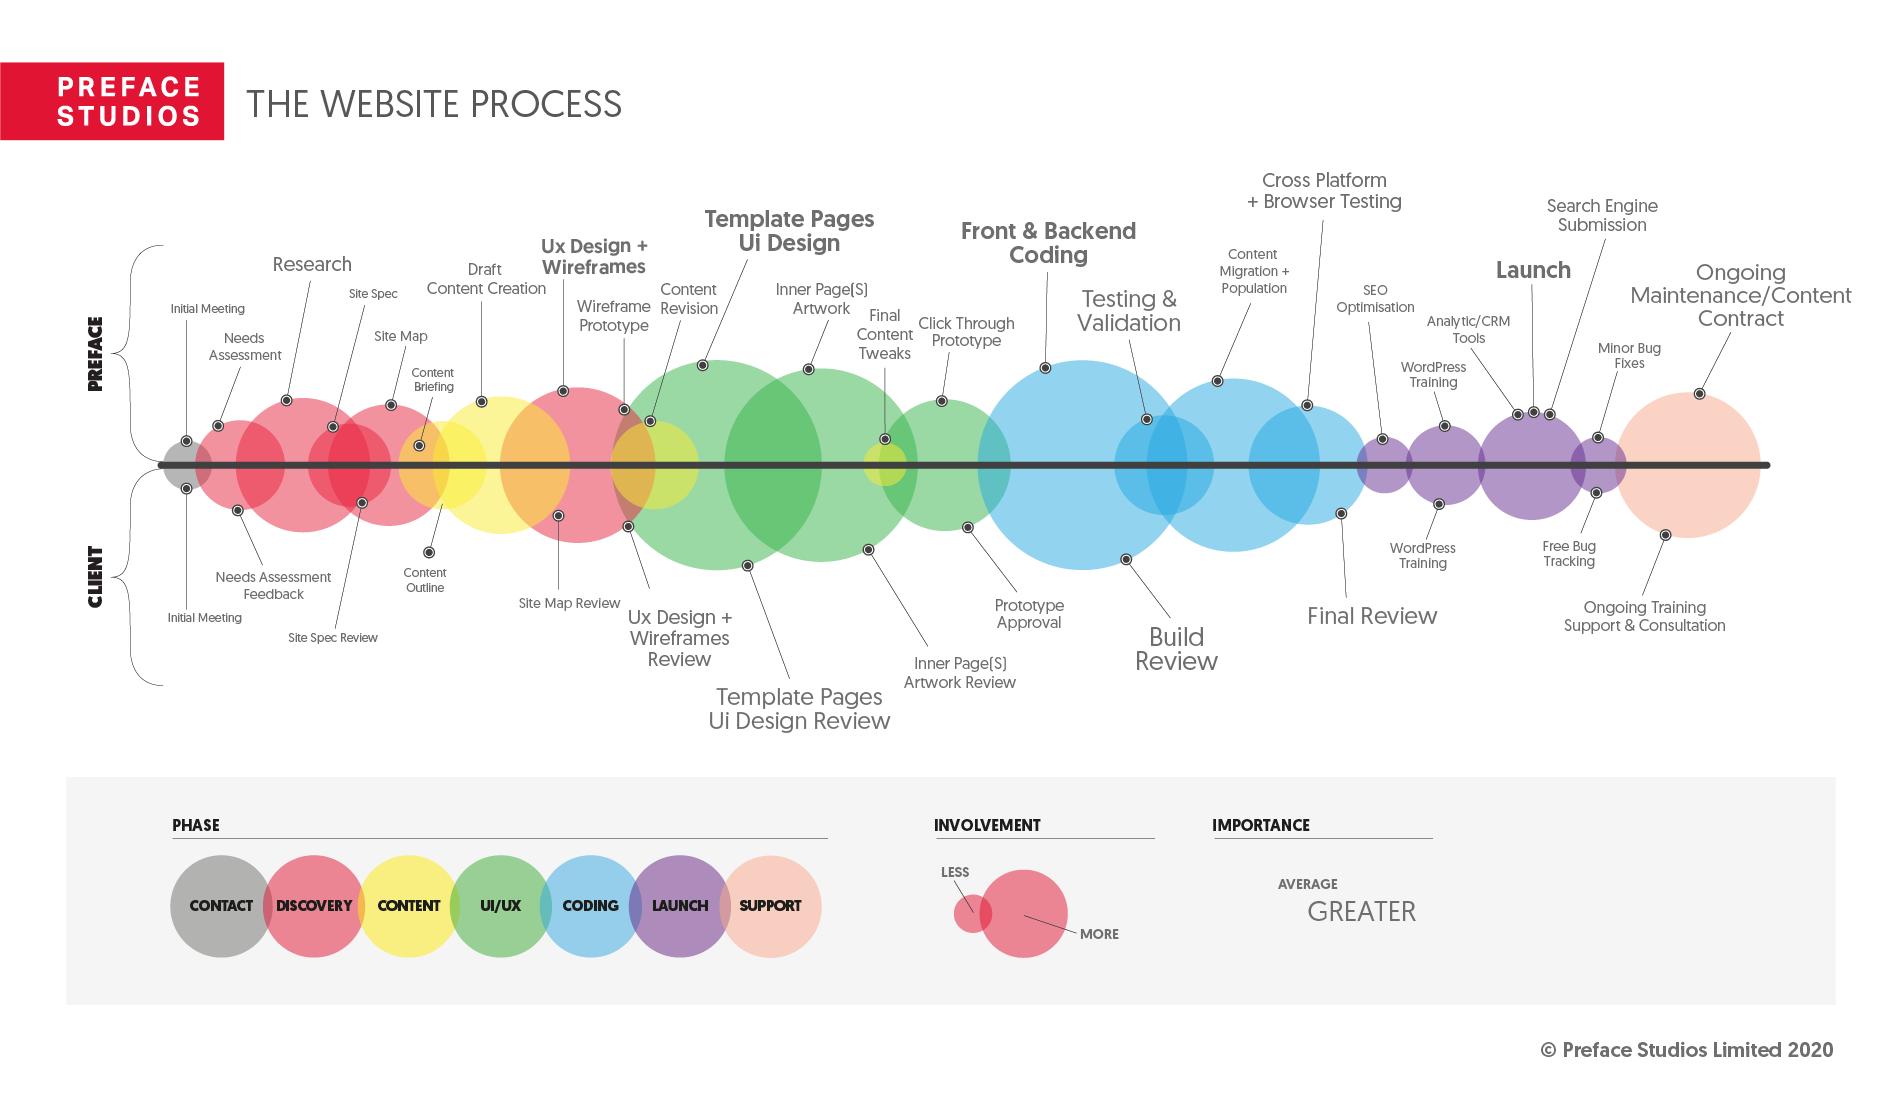 The Preface Web Design and Development Process